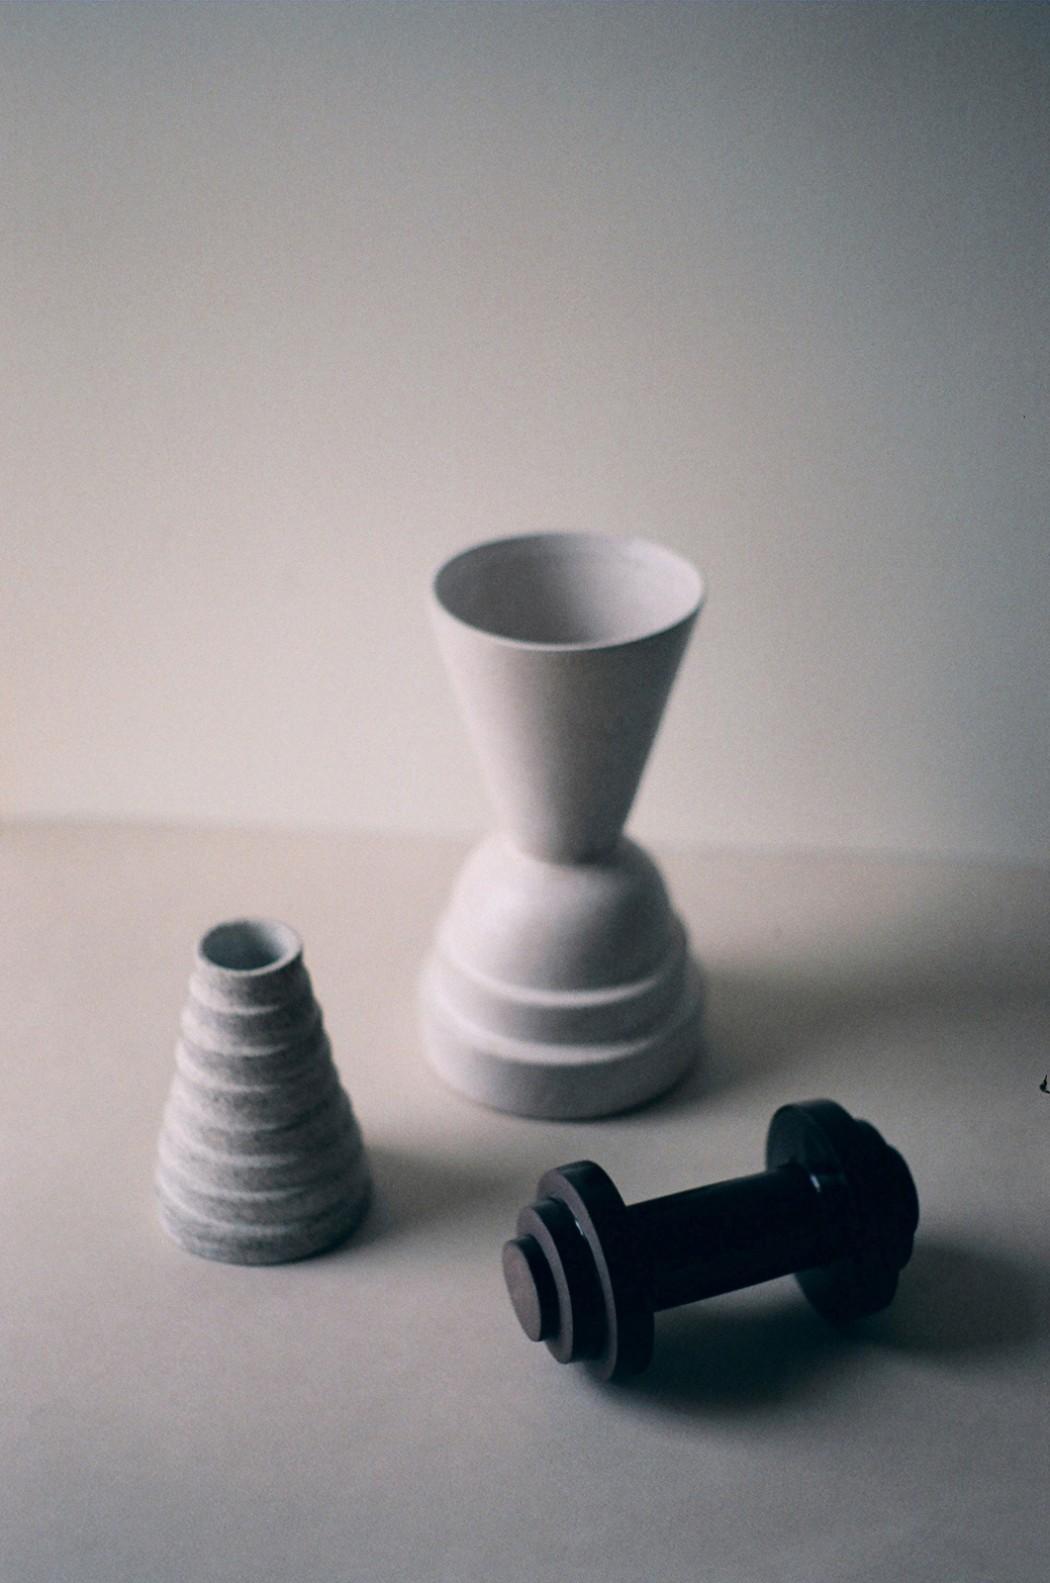 Design-Natalie-Weinberger-Ceramics-8-1050x1583